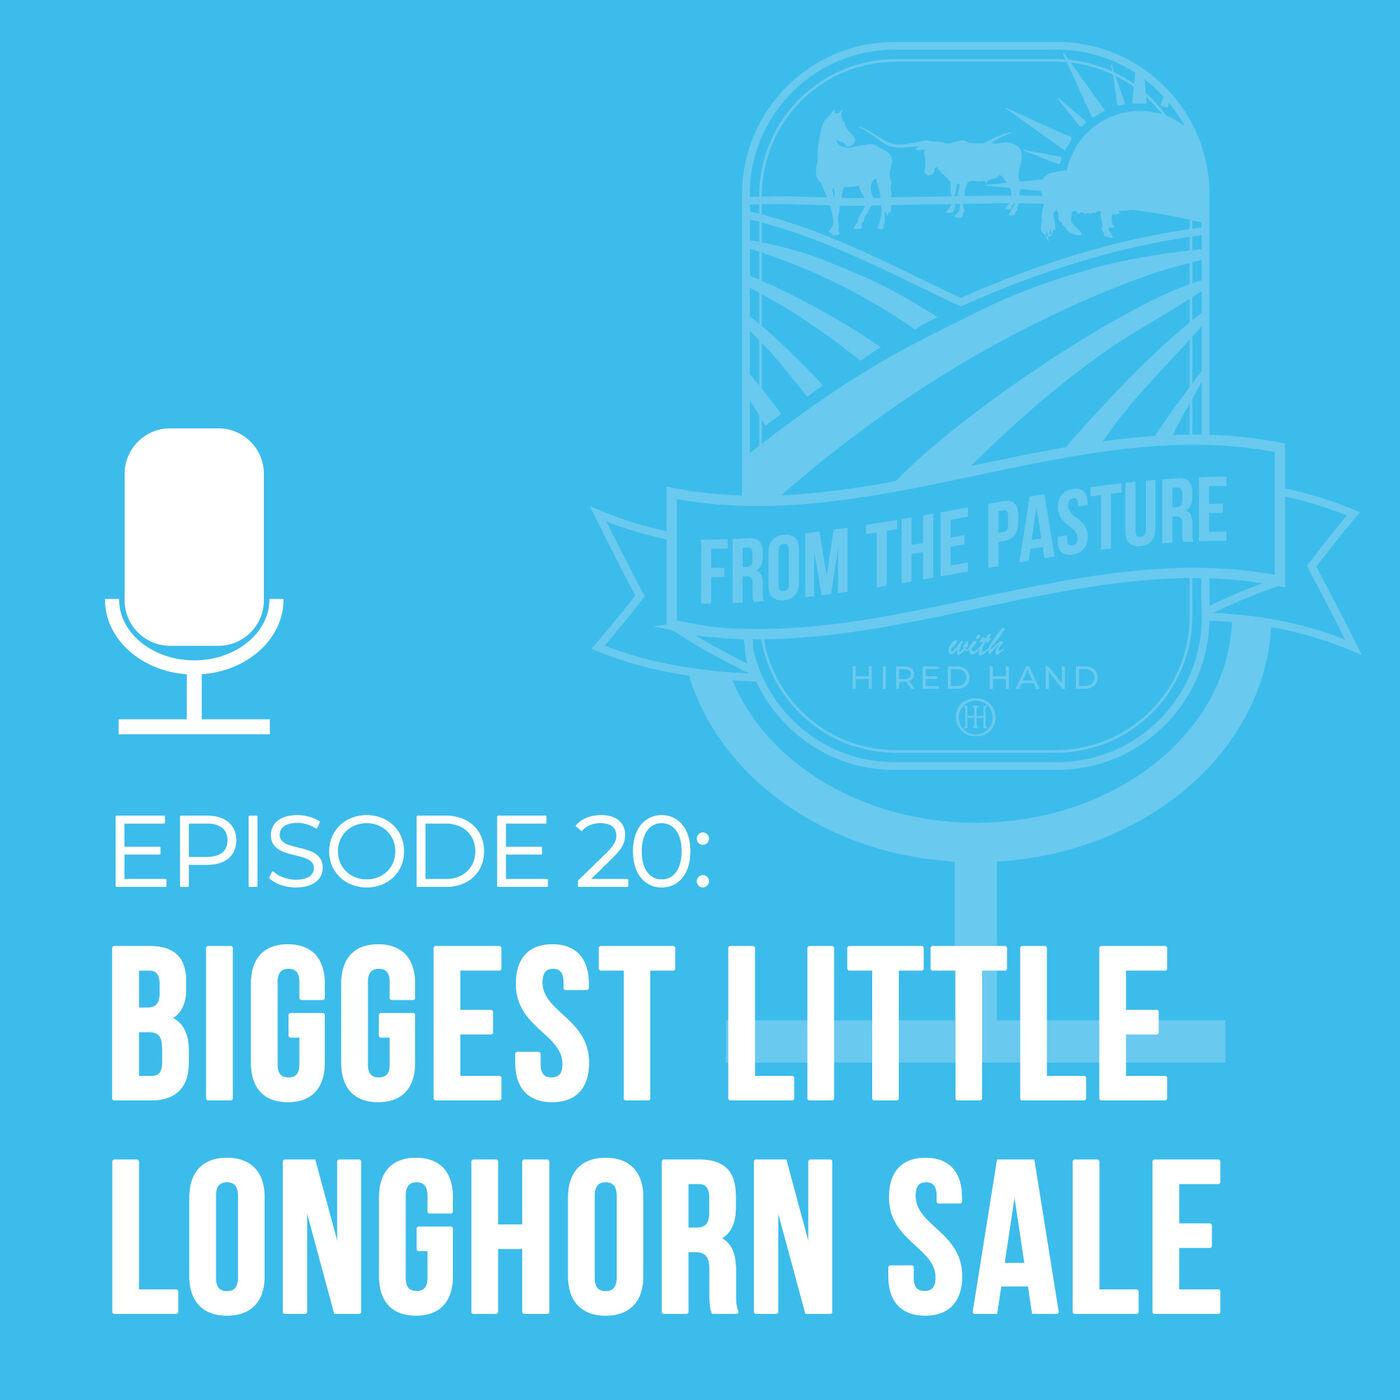 The Biggest Little Longhorn Sale